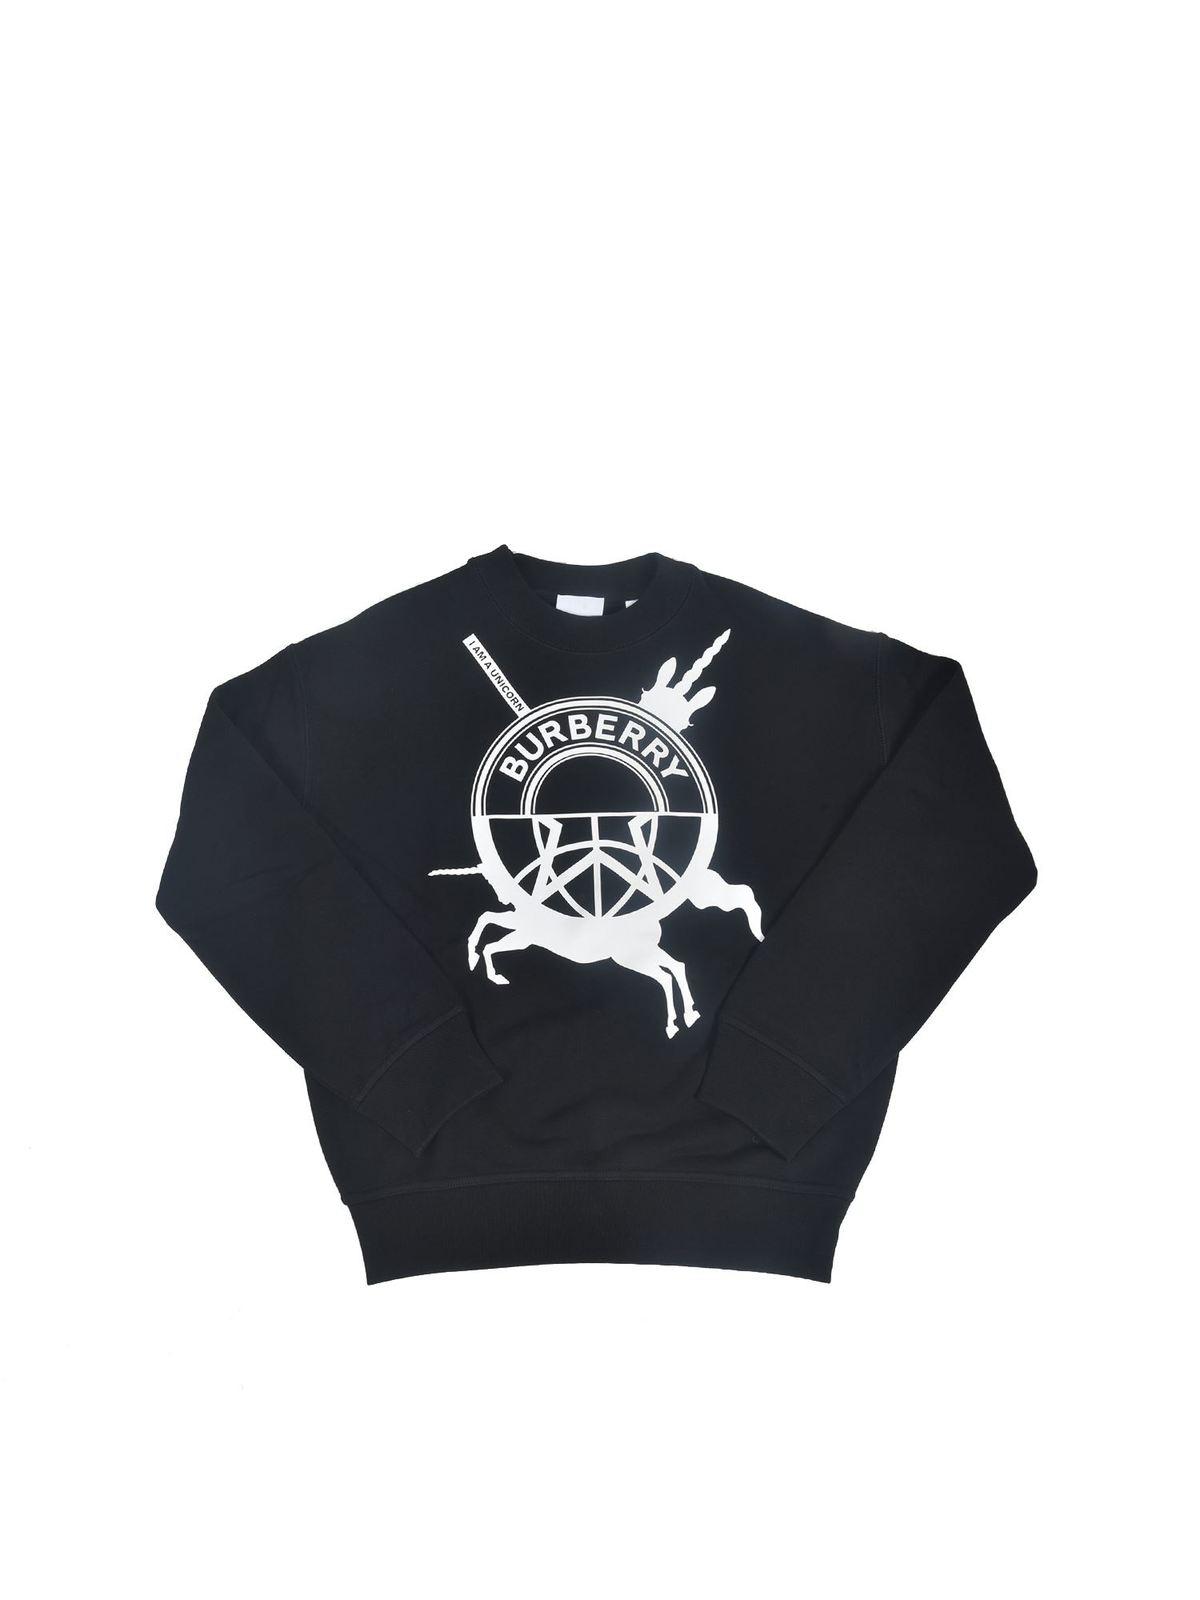 Burberry Kids' I Am A Unicorn Sweatshirt In Black